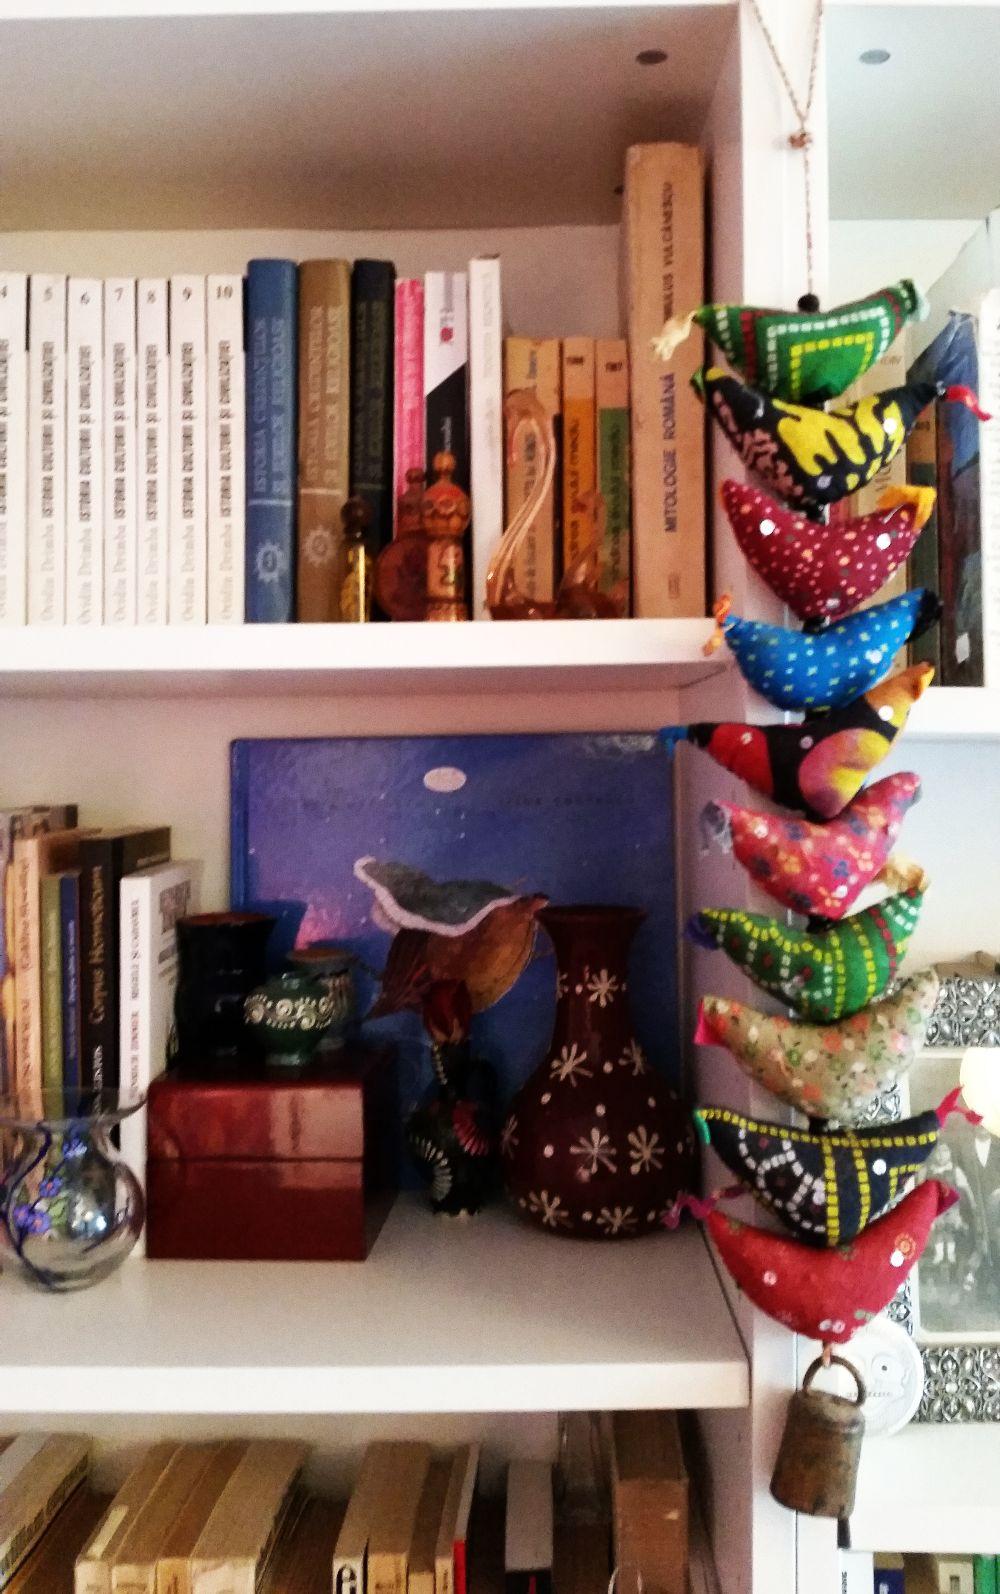 adelaparvu.com despre apartament 3 camere colorat in Sibiu, Foto Adela Parvu (15)